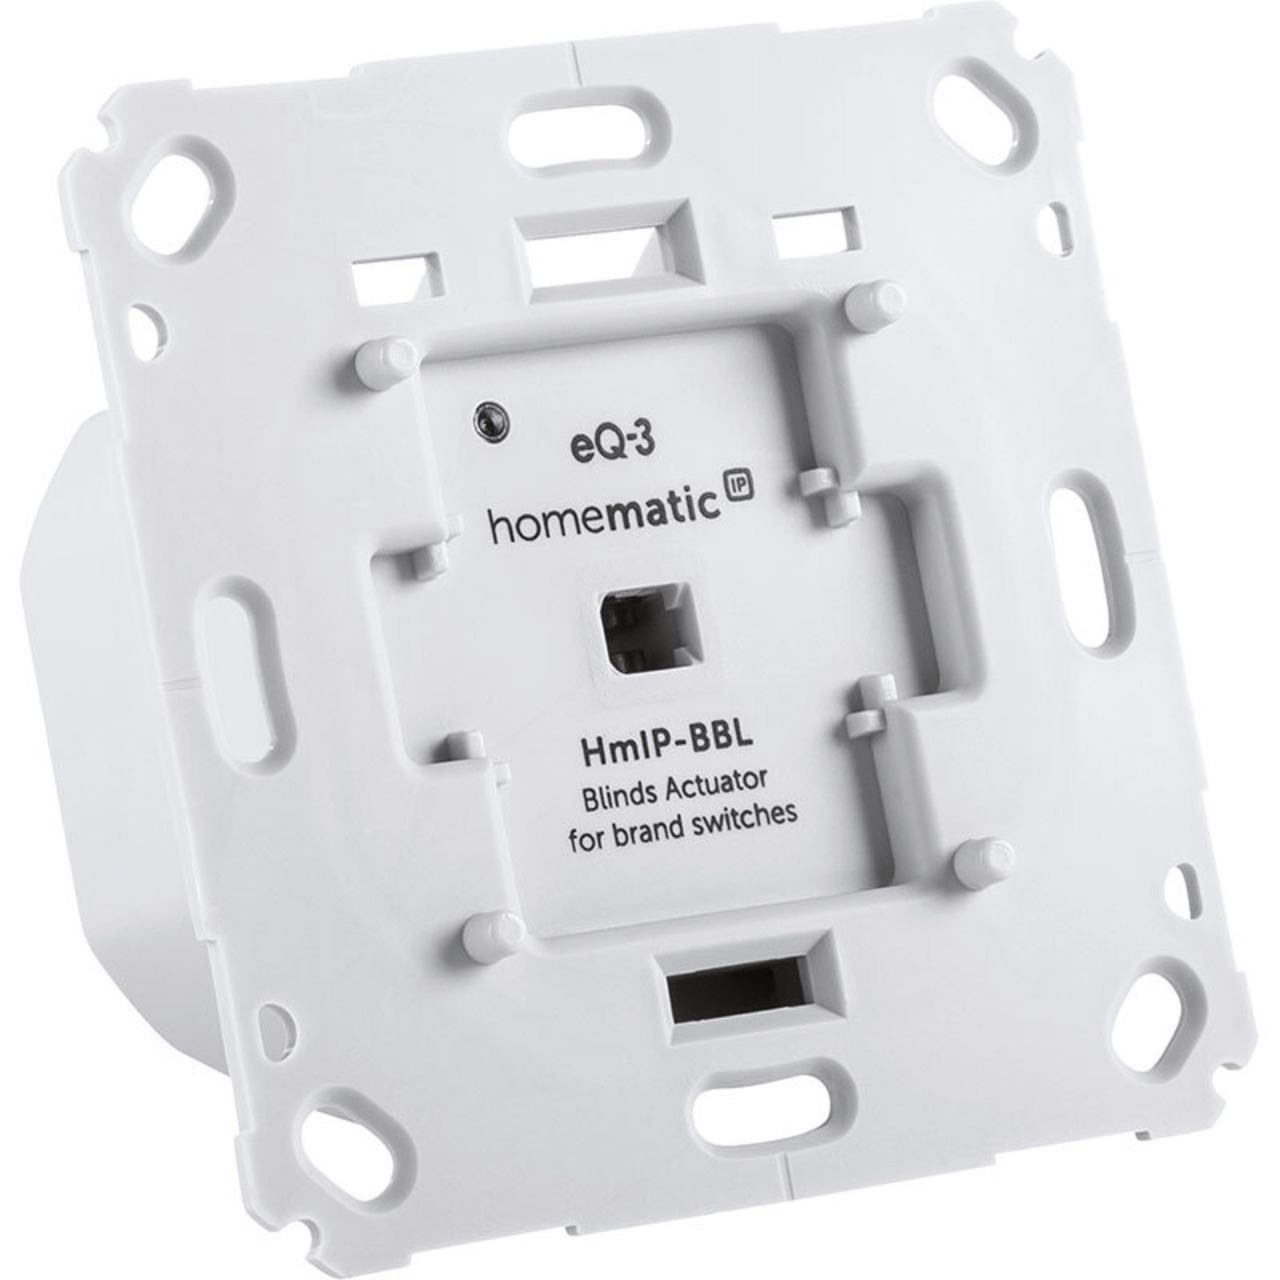 Homematic IP Smart Home Jalousieaktor HmIP-BBL für Markenschalter